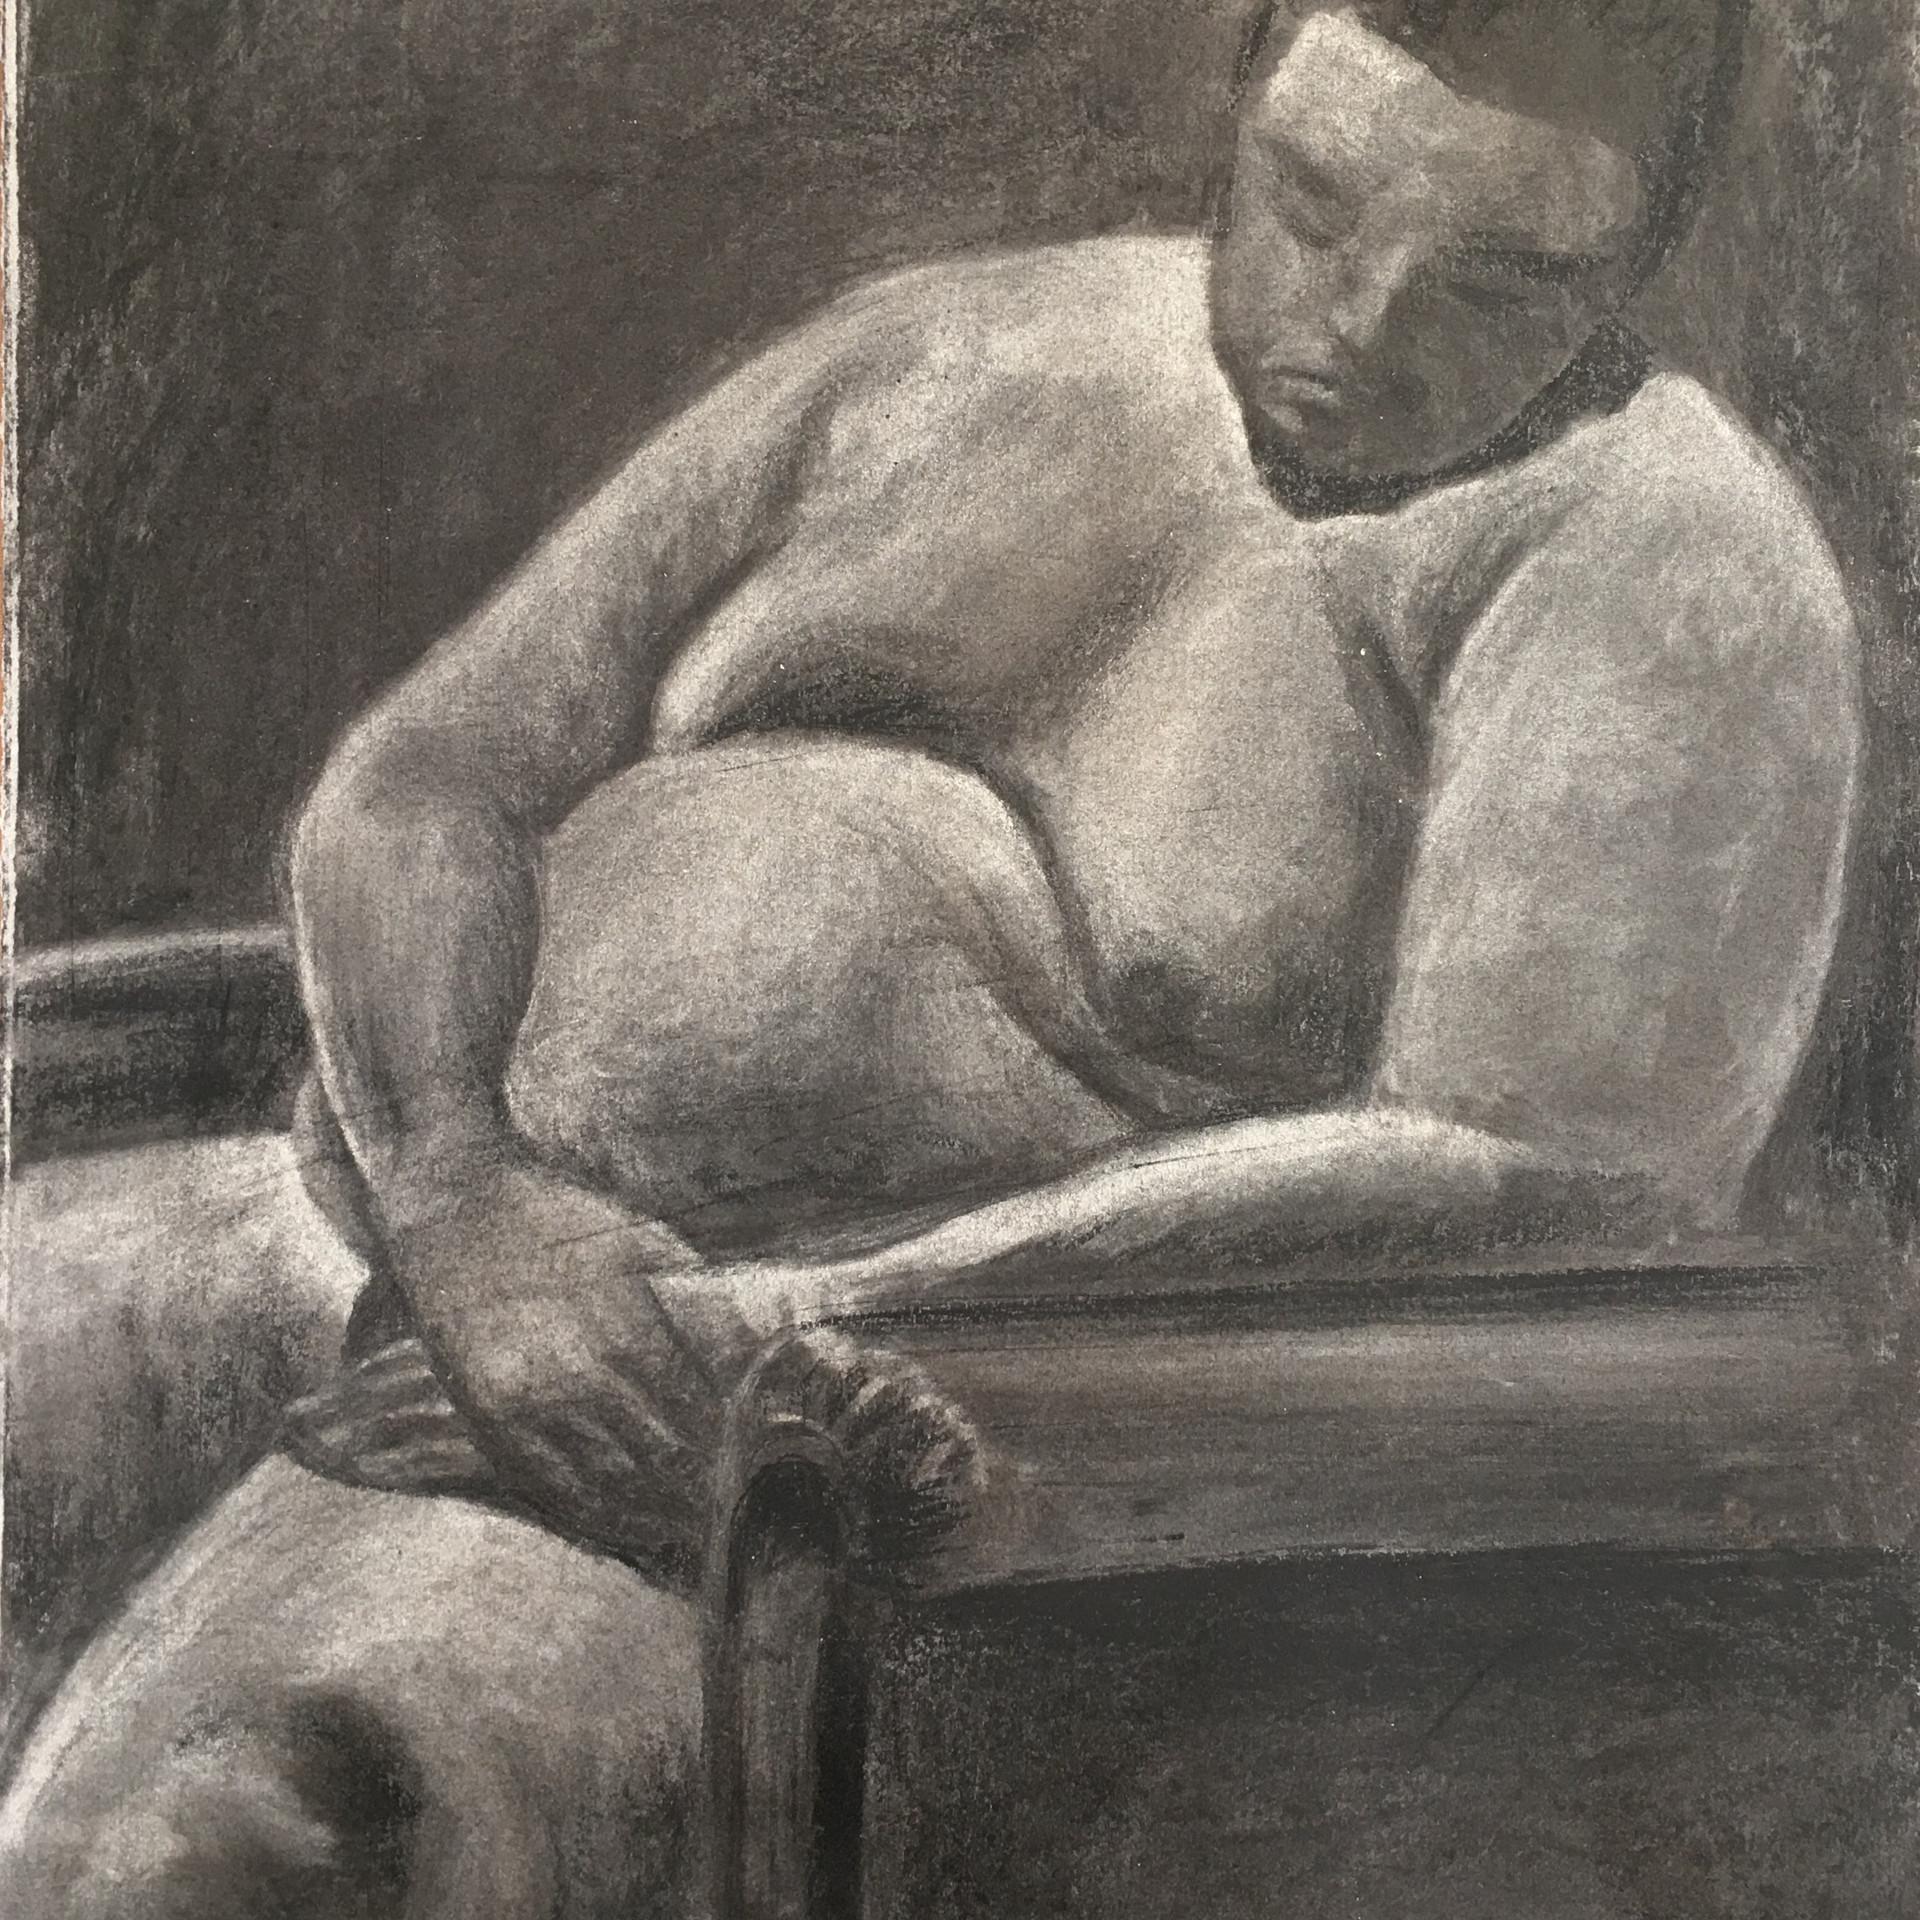 Nude Figure I (study of the human body).